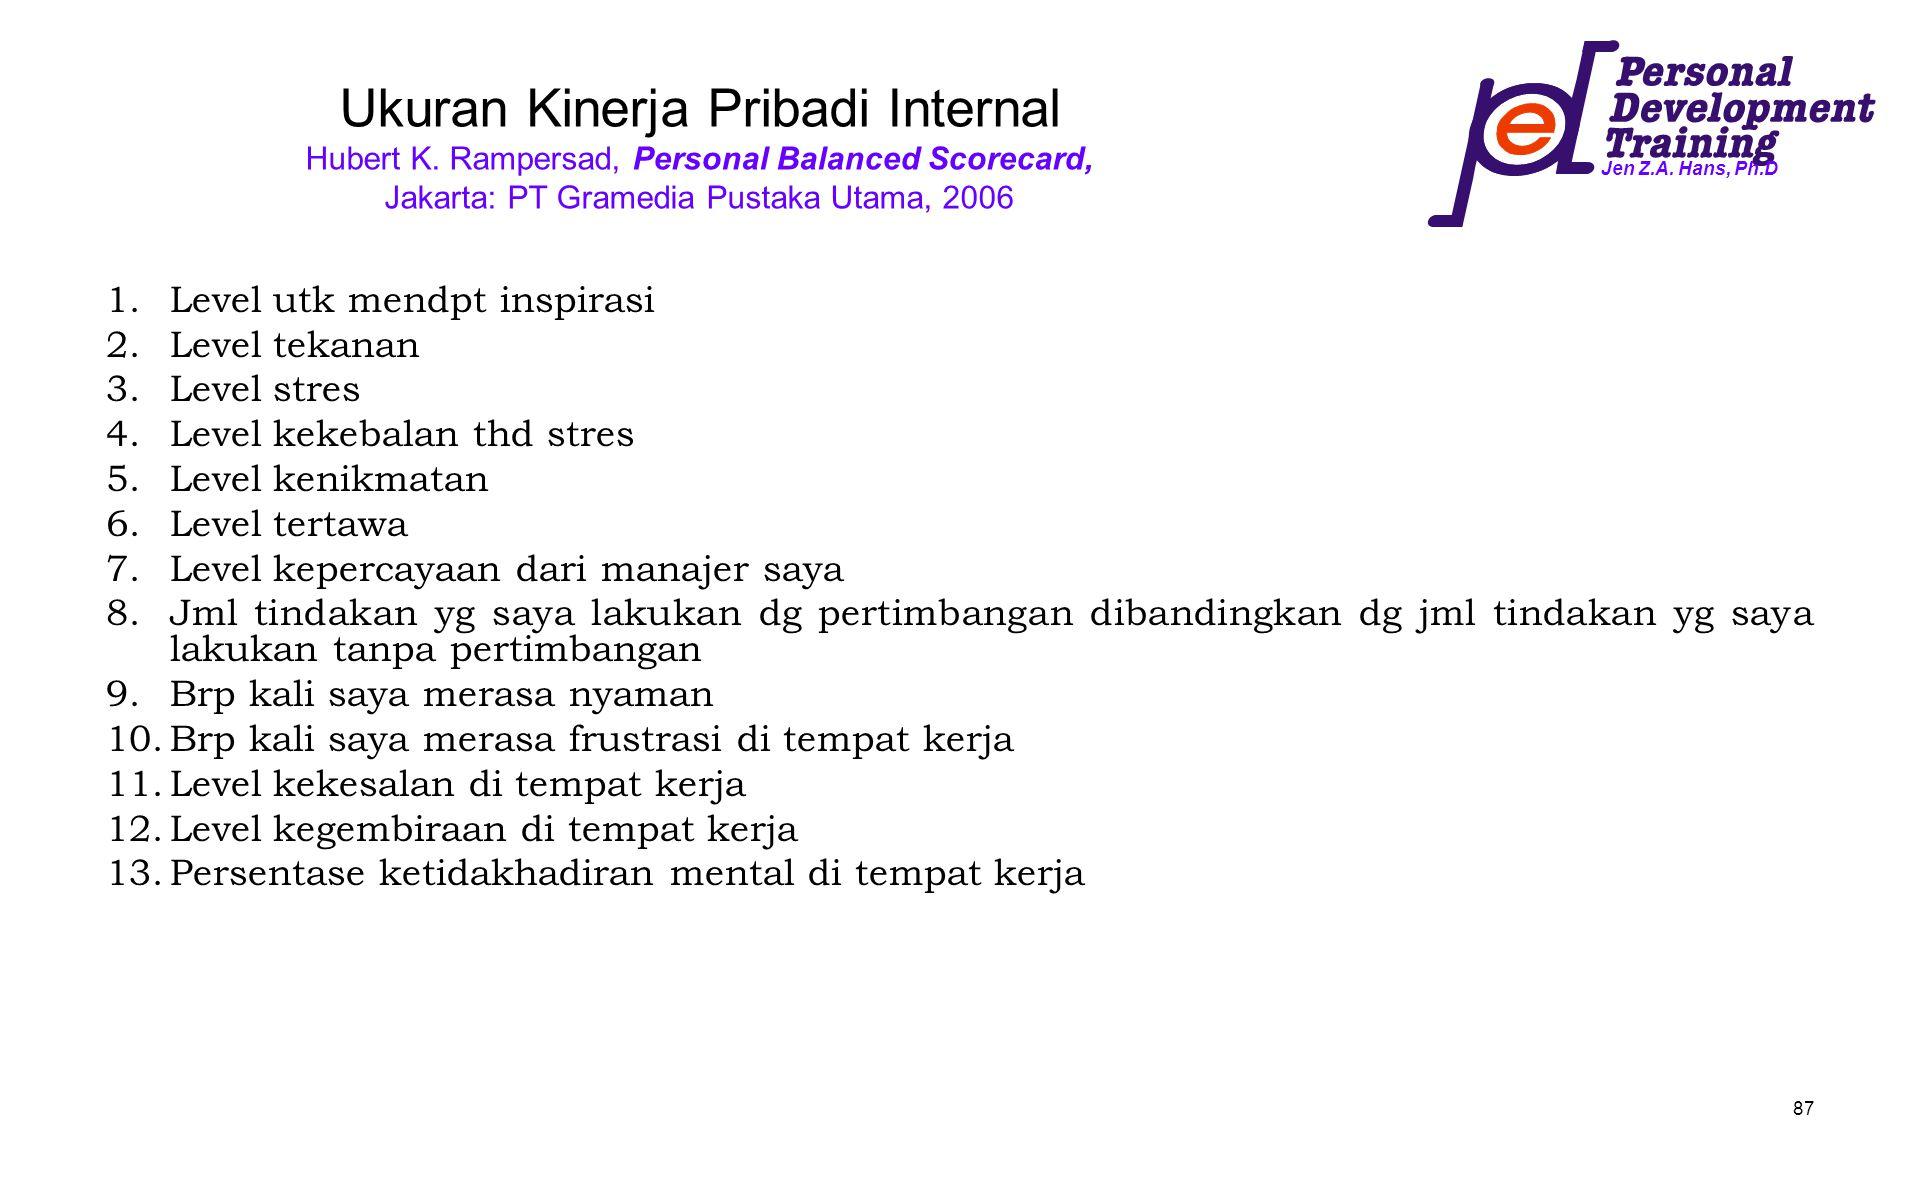 Jen Z.A. Hans, Ph.D 87 Ukuran Kinerja Pribadi Internal Hubert K. Rampersad, Personal Balanced Scorecard, Jakarta: PT Gramedia Pustaka Utama, 2006 1.Le